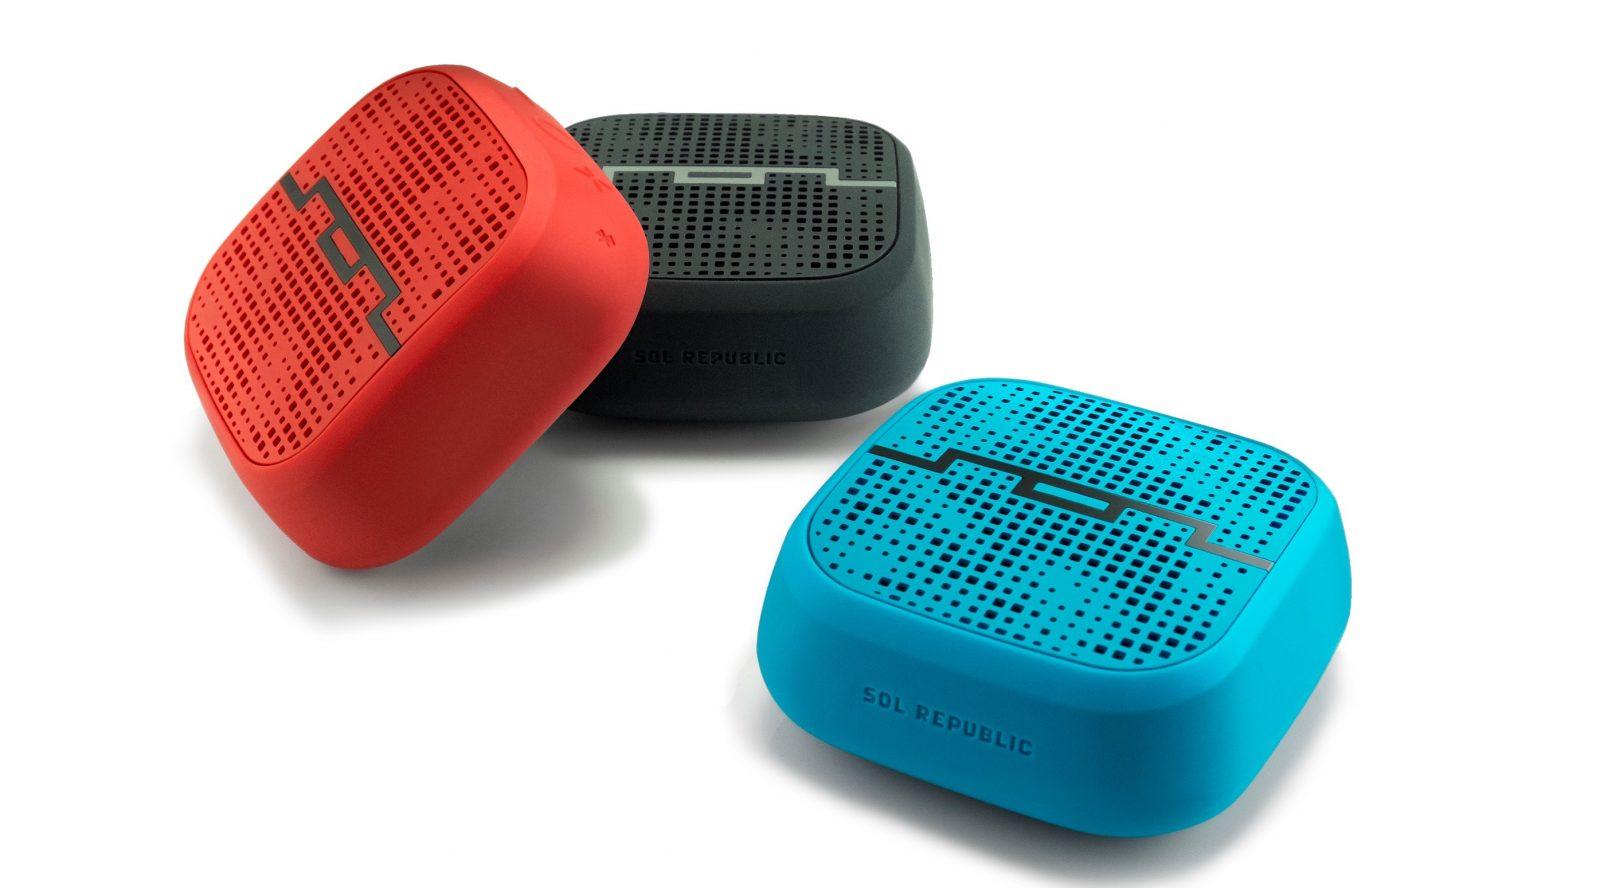 SOL-REPUBLIC_Punk_-Family Wireless Bluetooth Speakers - Analie Cruz